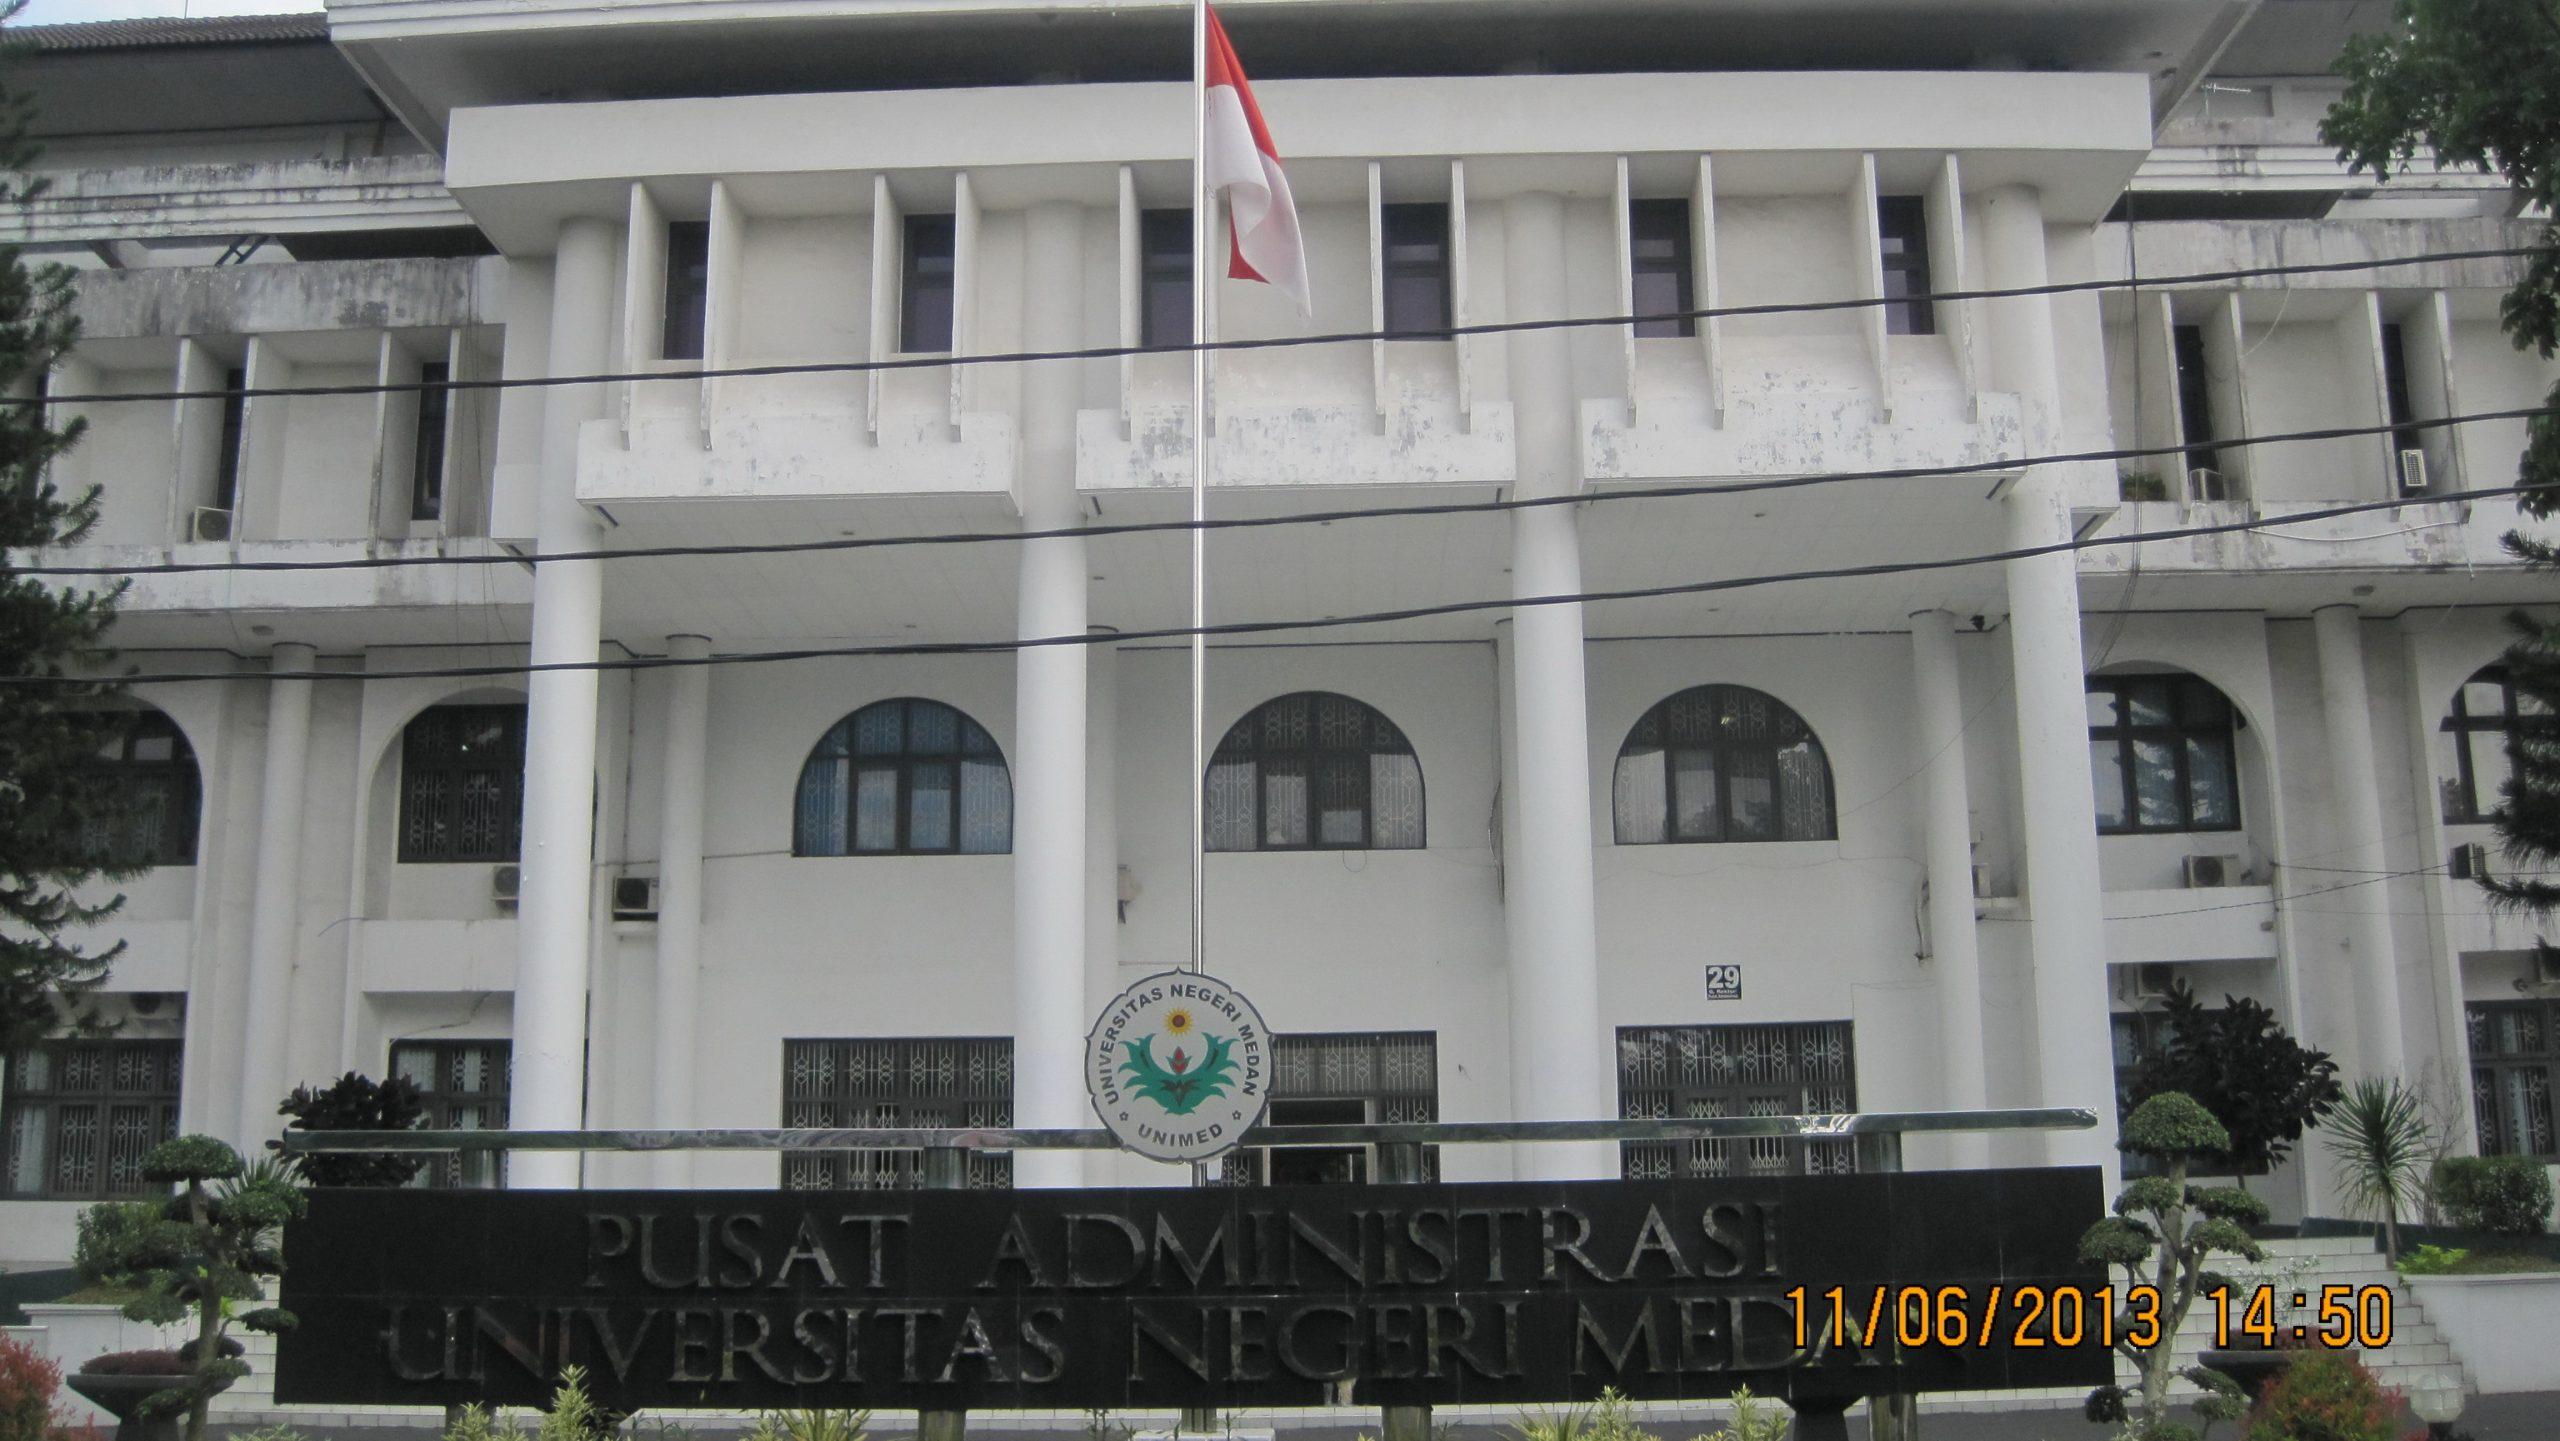 G. 29 Pusat Administrasi2